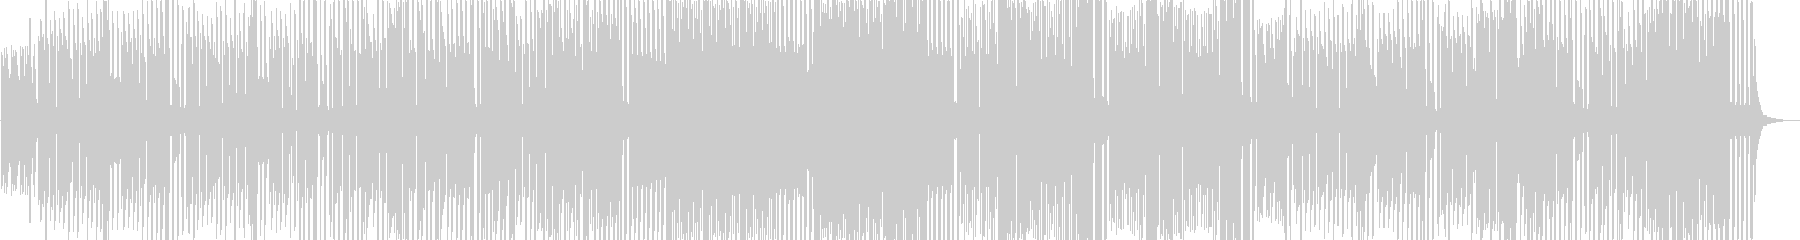 KANT運動会曲クシコスポスト8bitの未再生の波形